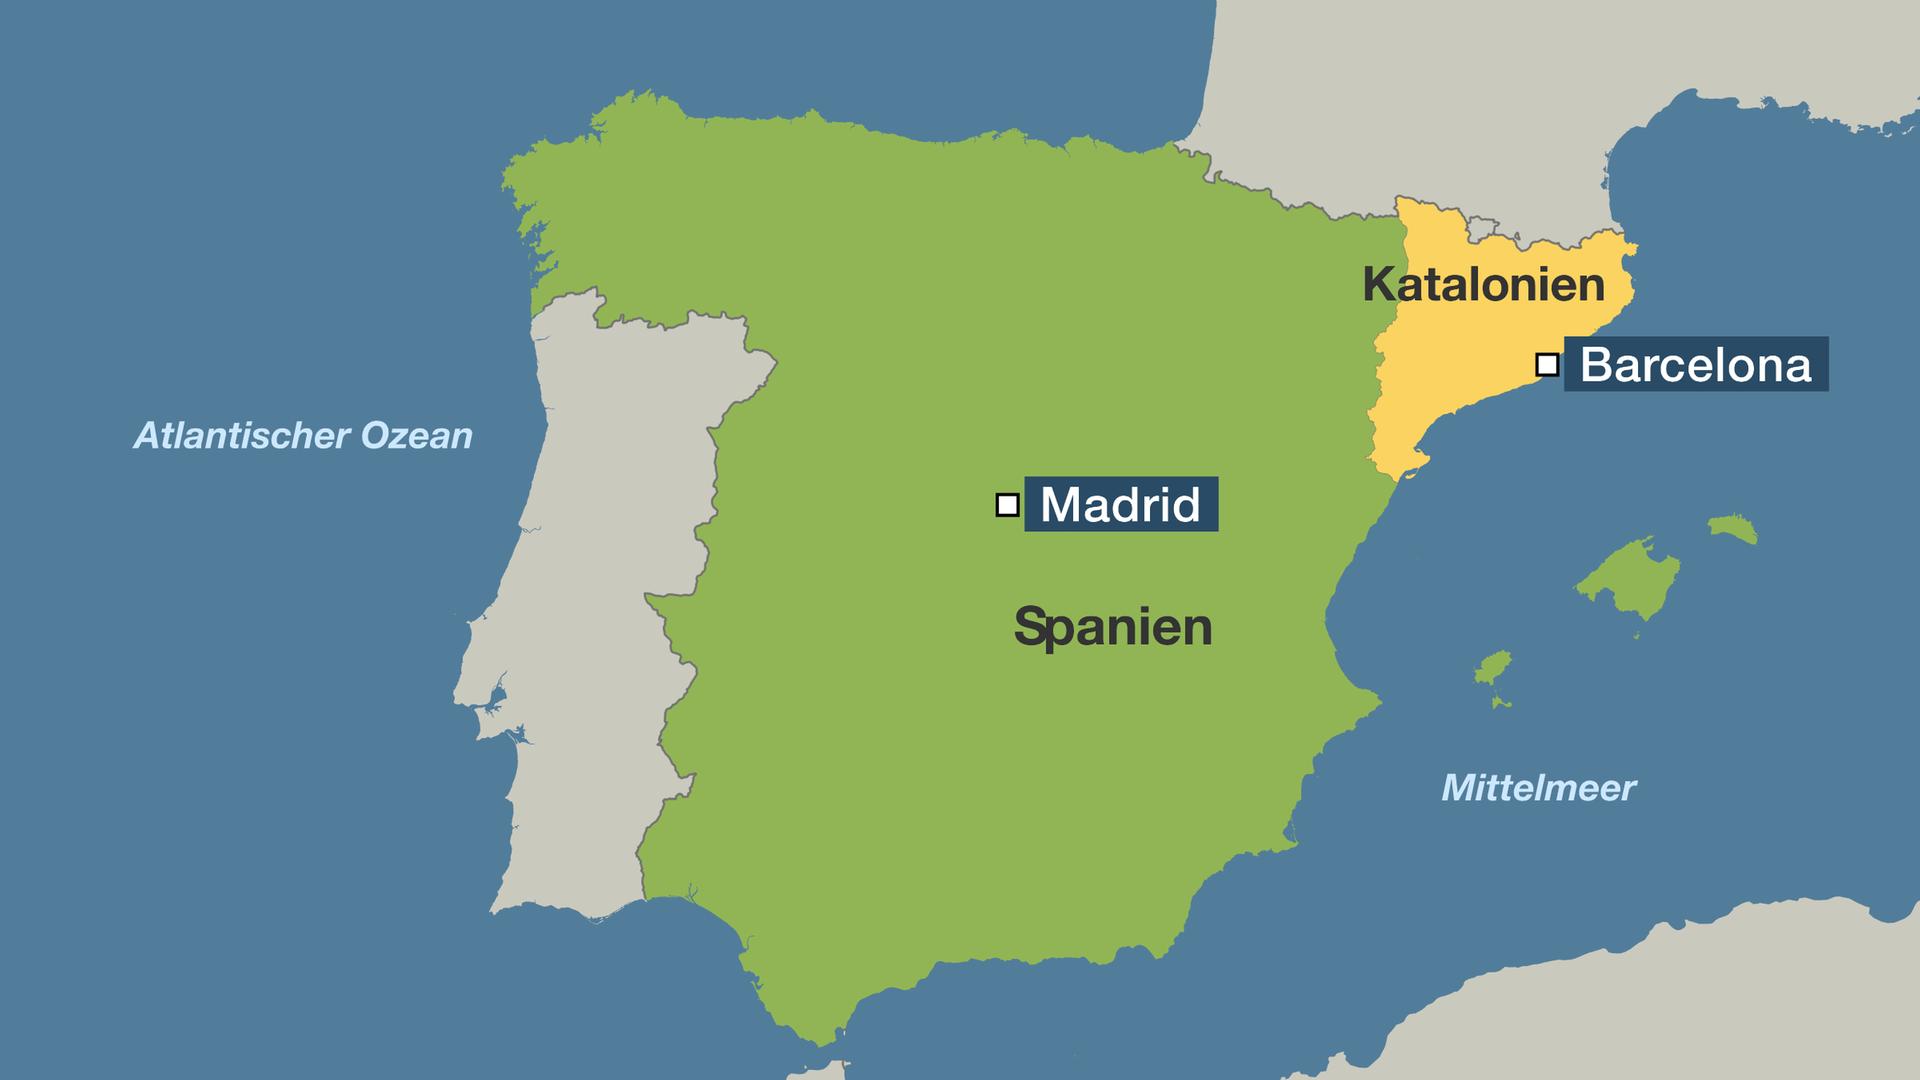 spanien katalonien karte Spanien Katalonien Karte | hanzeontwerpfabriek